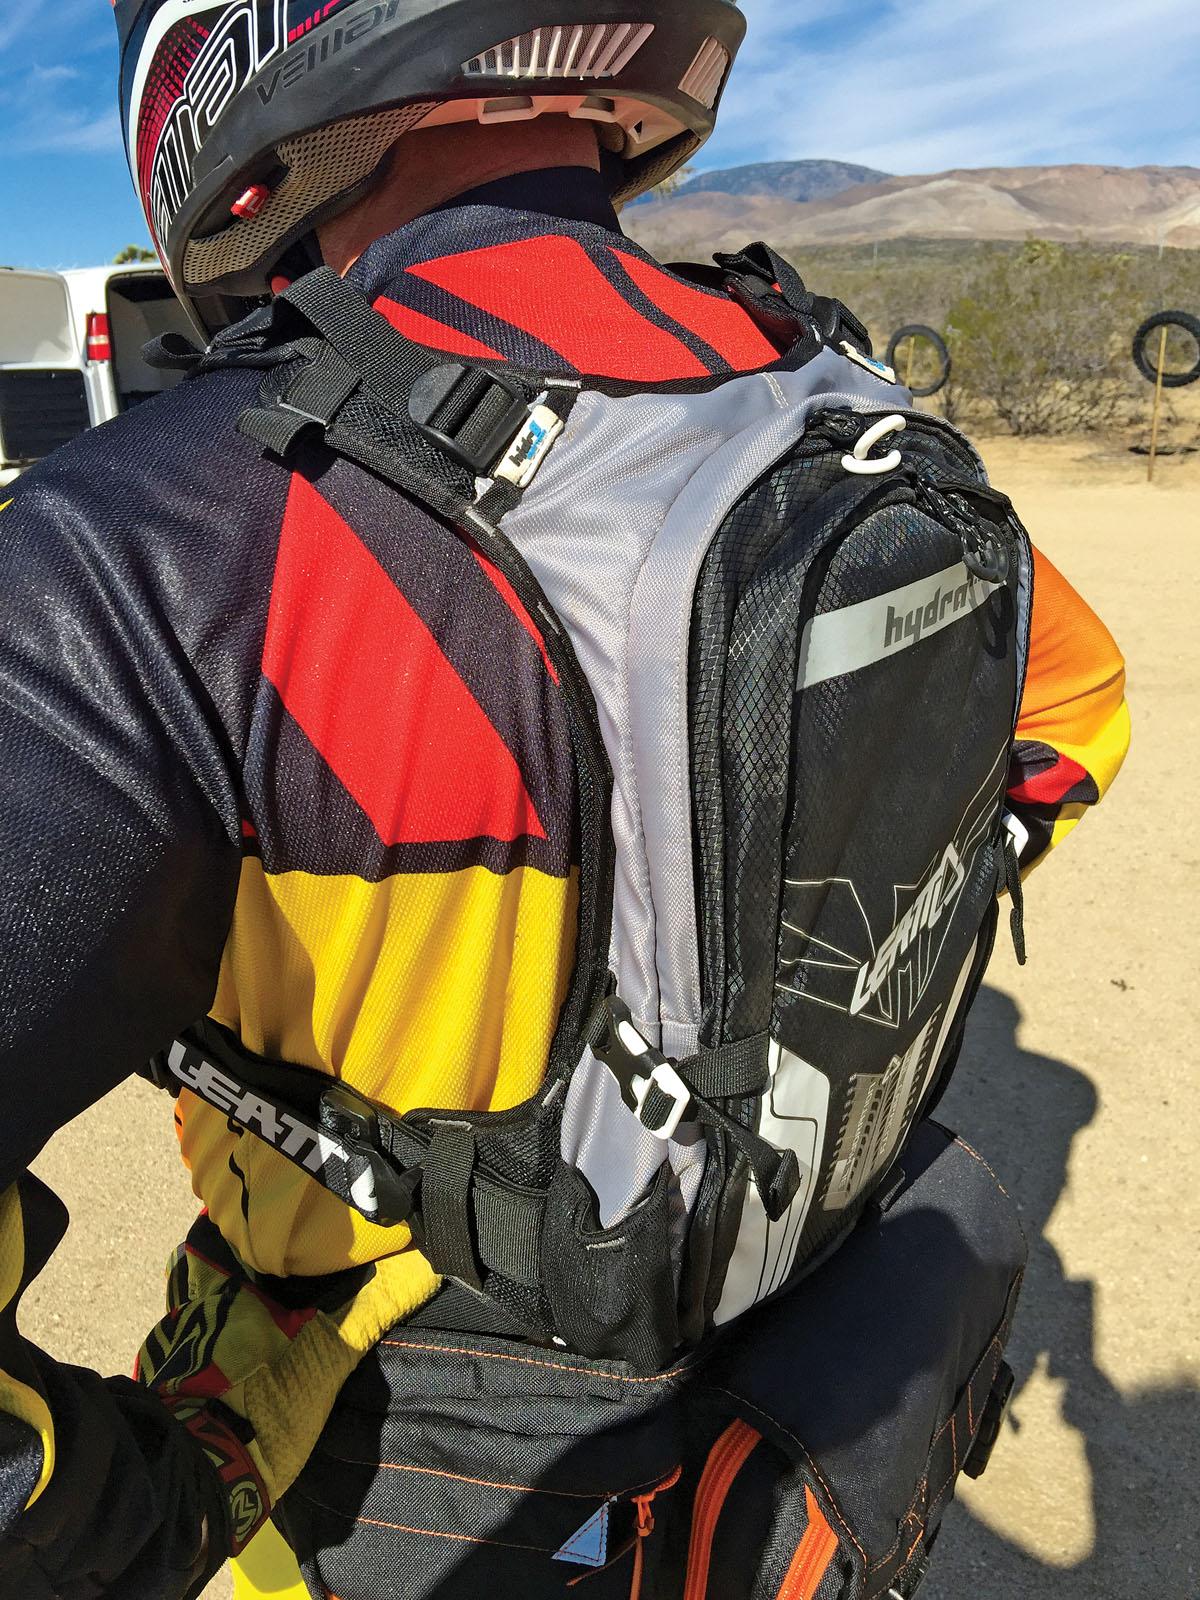 Leatt GPX 4.5 Hydra Chest Protector